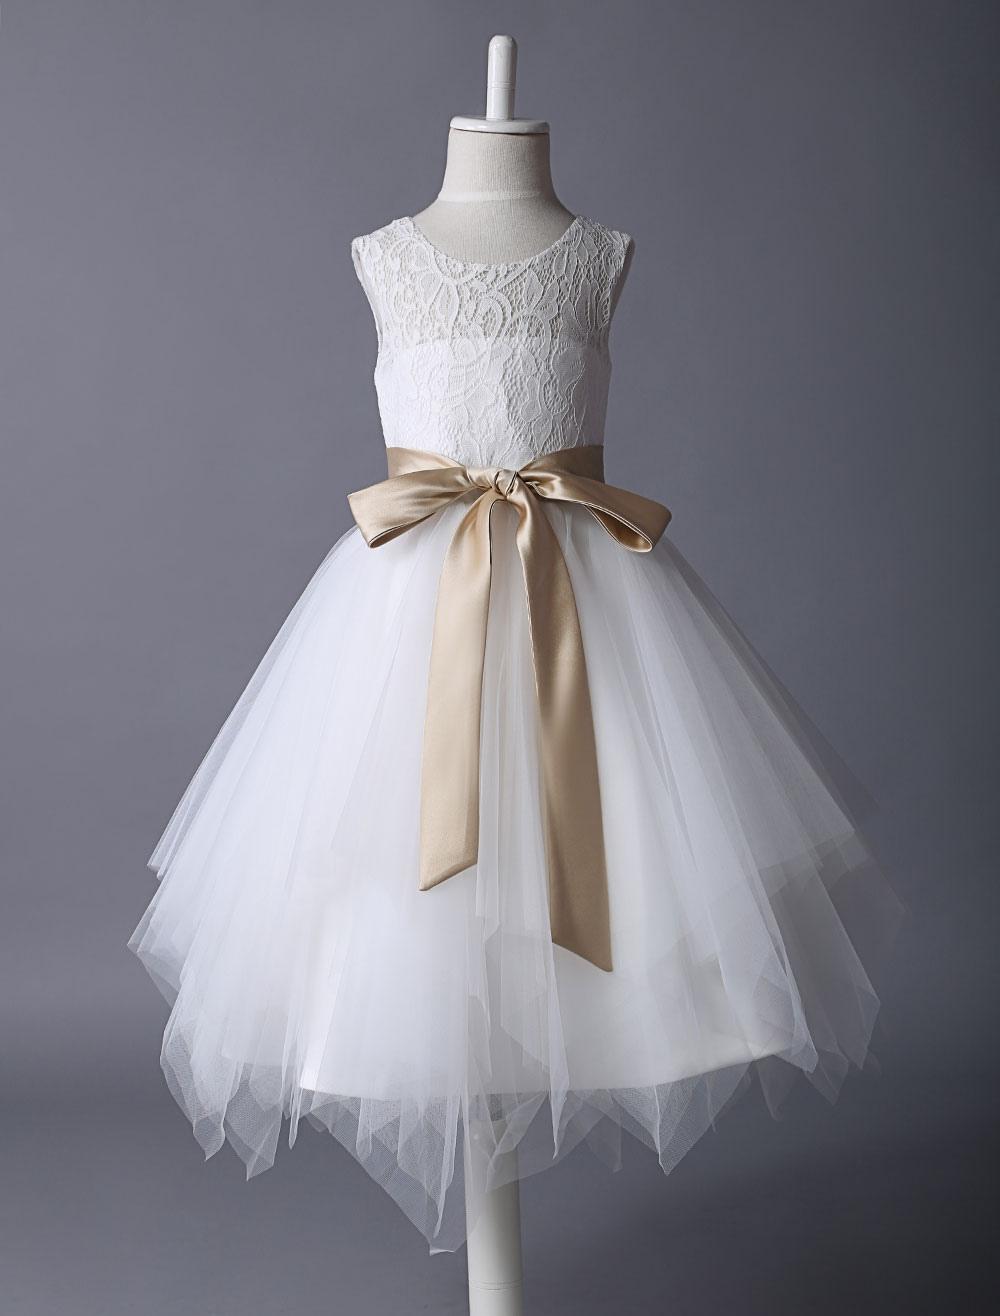 Flower Girl Dress Lace Ivory Tutu Dress Satin Ribbon Bow Sash Illusion Kids Party Dress